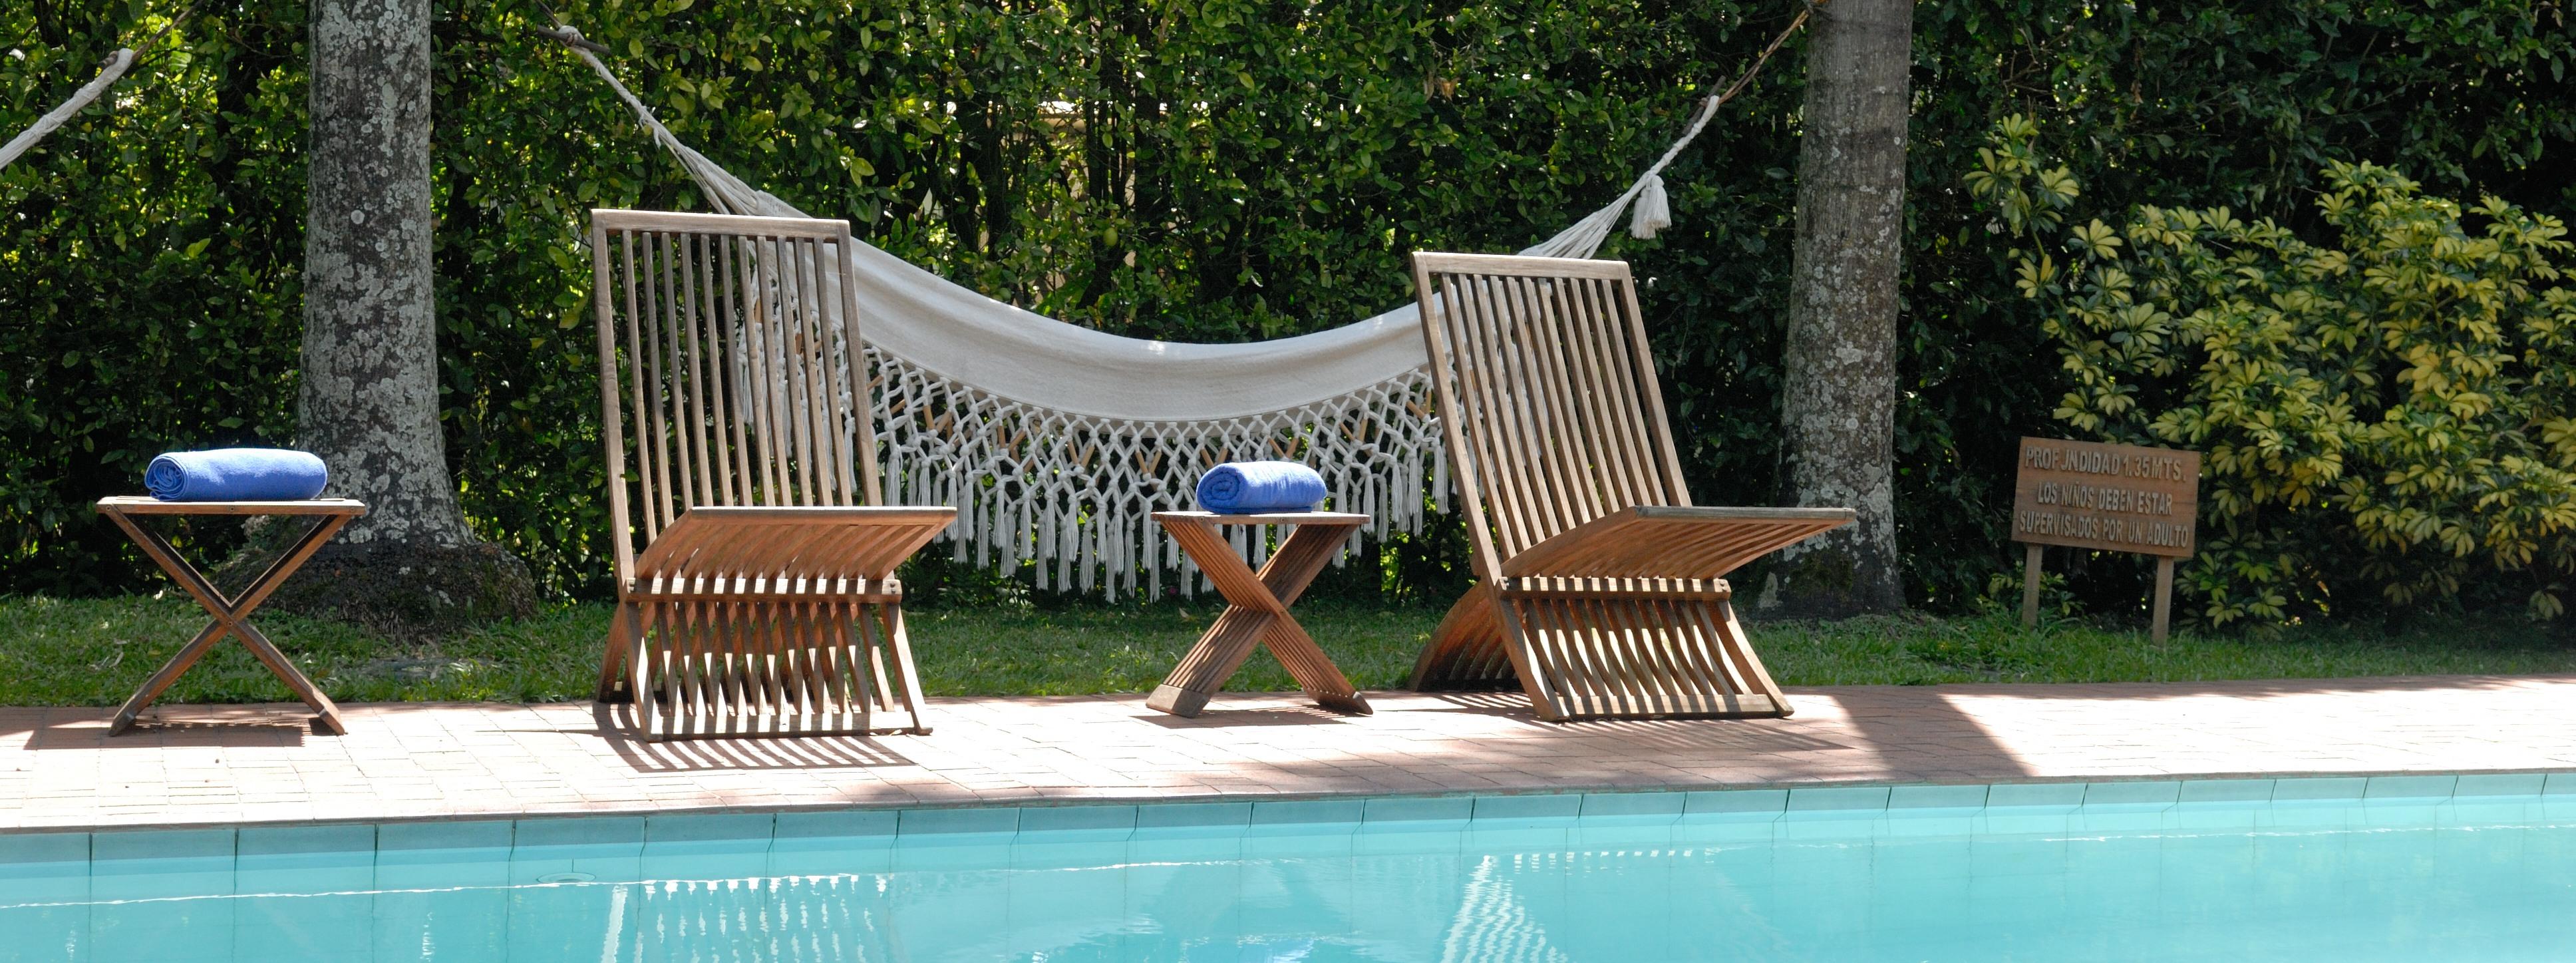 http://www.kontour-travel.com/wp-content/uploads/pool-hammock.jpg